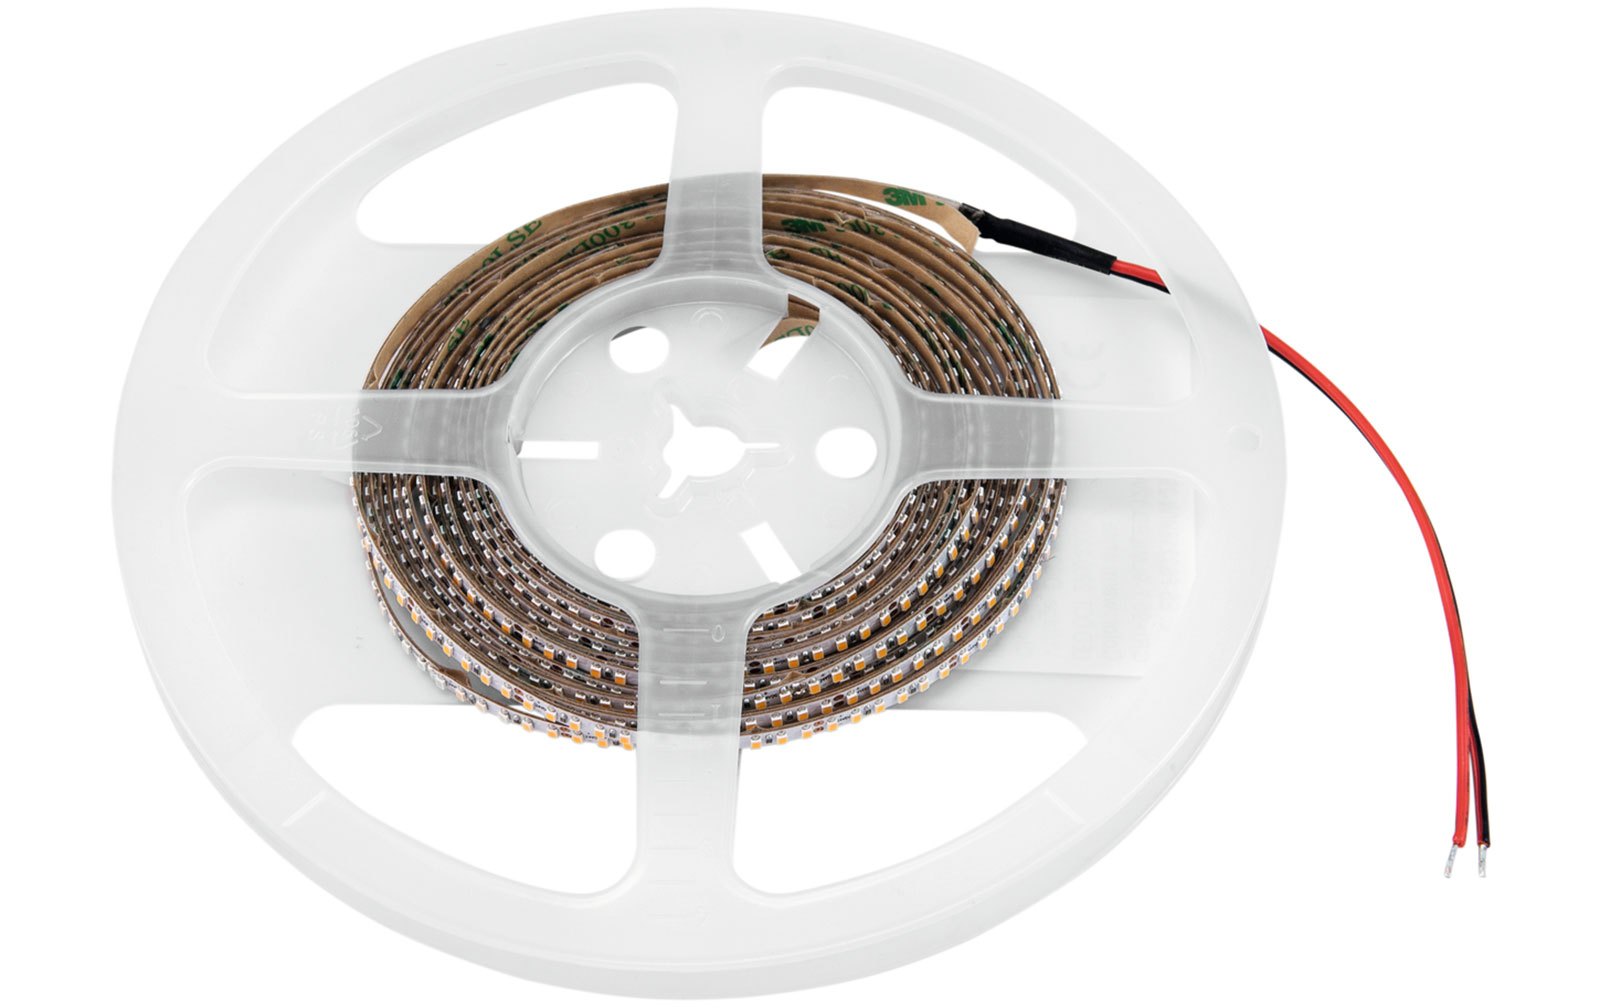 eurolite-led-strip-1320-5m-2216-2700k-24v